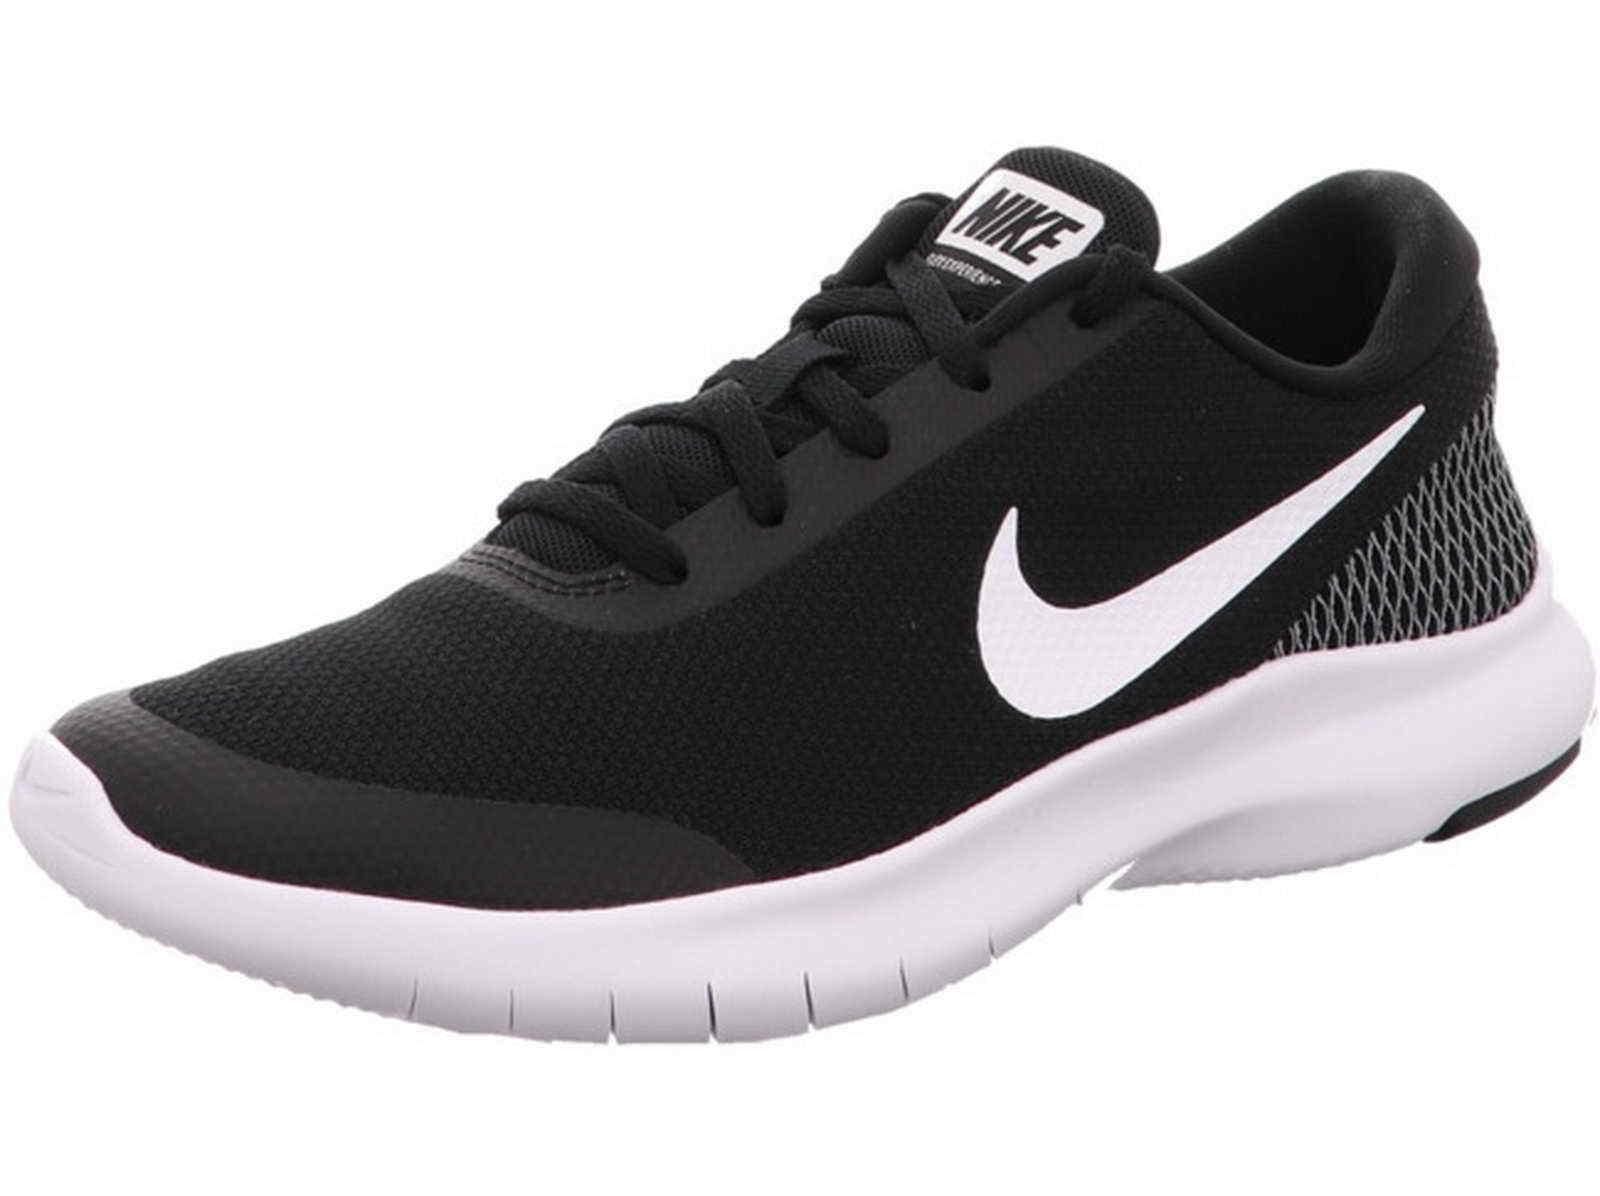 Nike Trend Experience Sneaker Flex Experience Trend schwarz weiß 908996 001 92c698